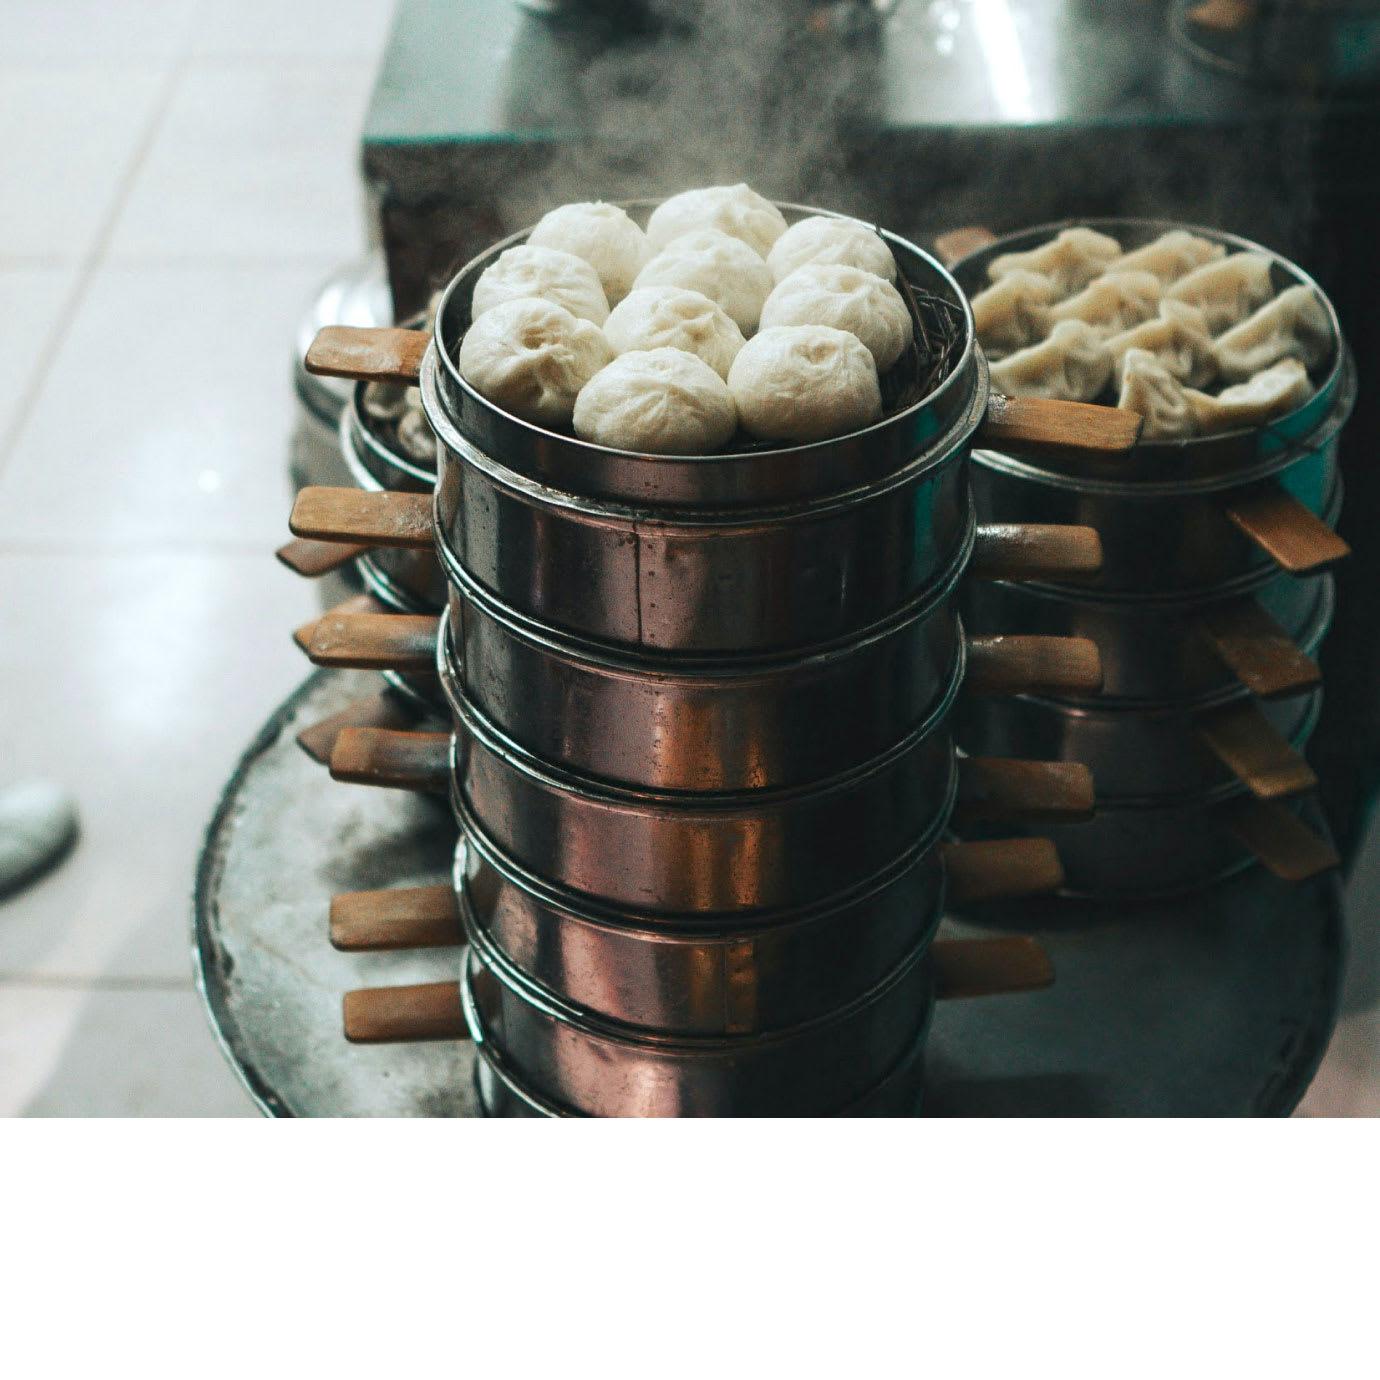 Dim sum dumplings on trays.